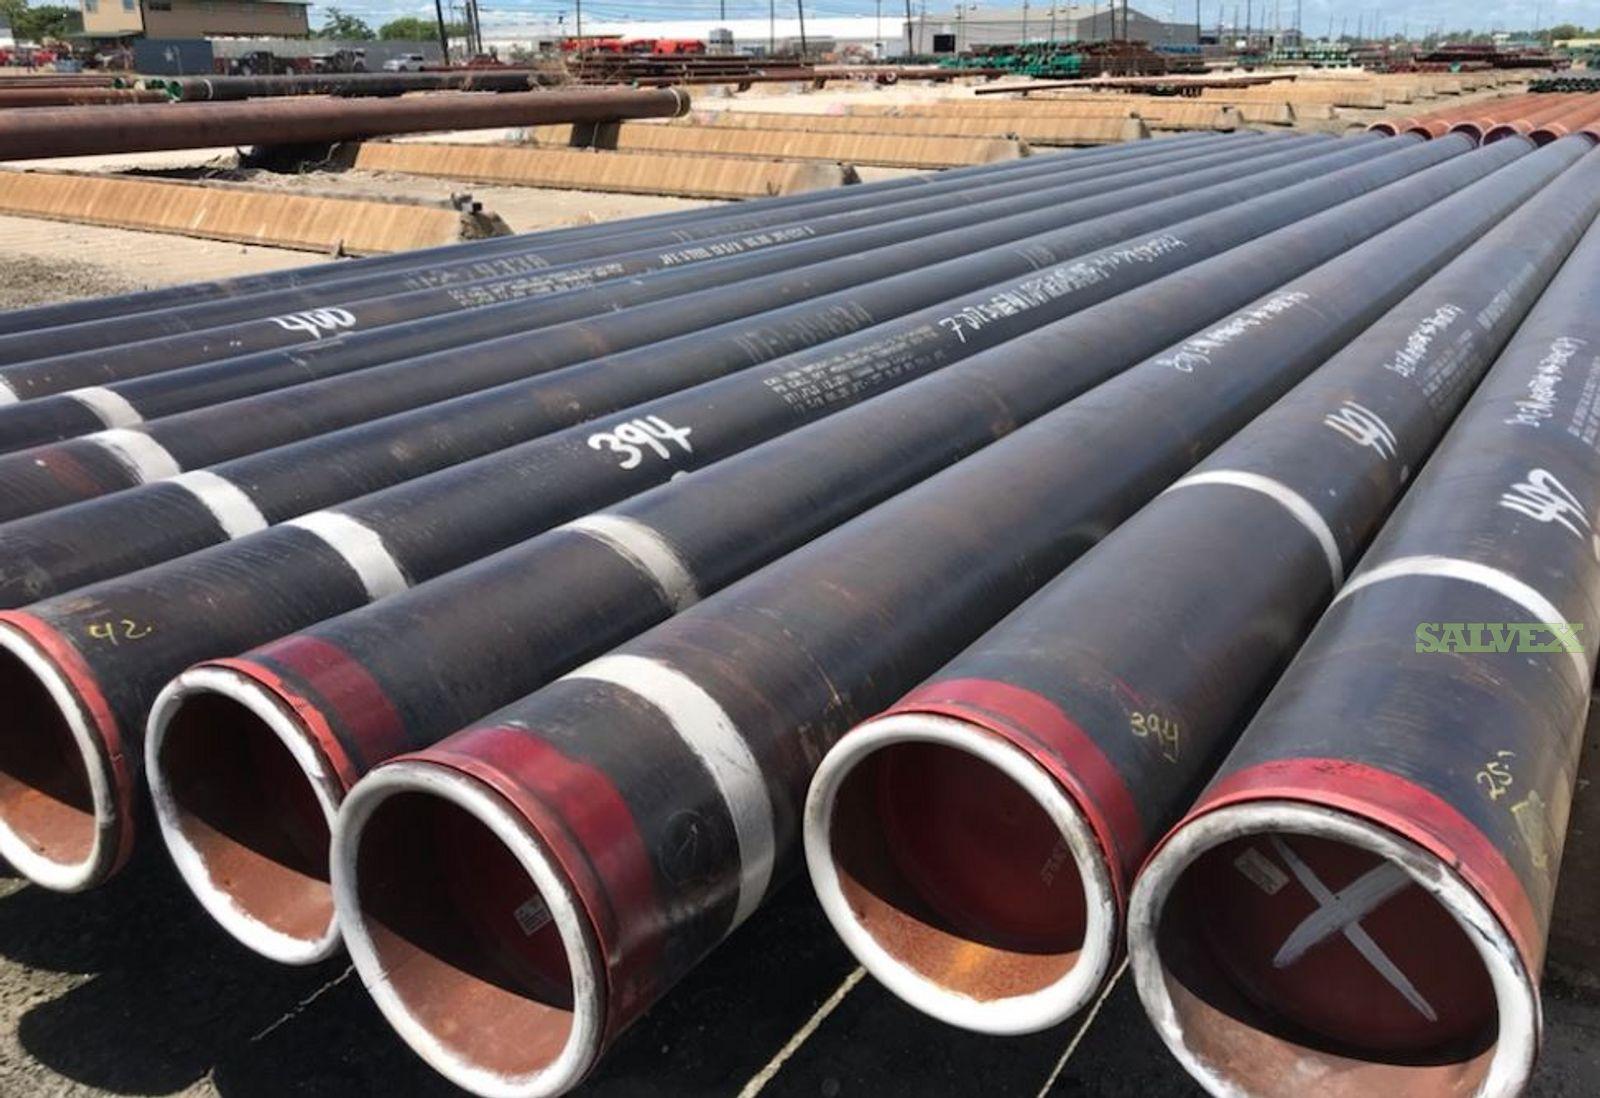 13 5/8 88.20# Q-125 HC SLSF R3 Reject Casing (1,916 Feet / 77 Metric Tons)